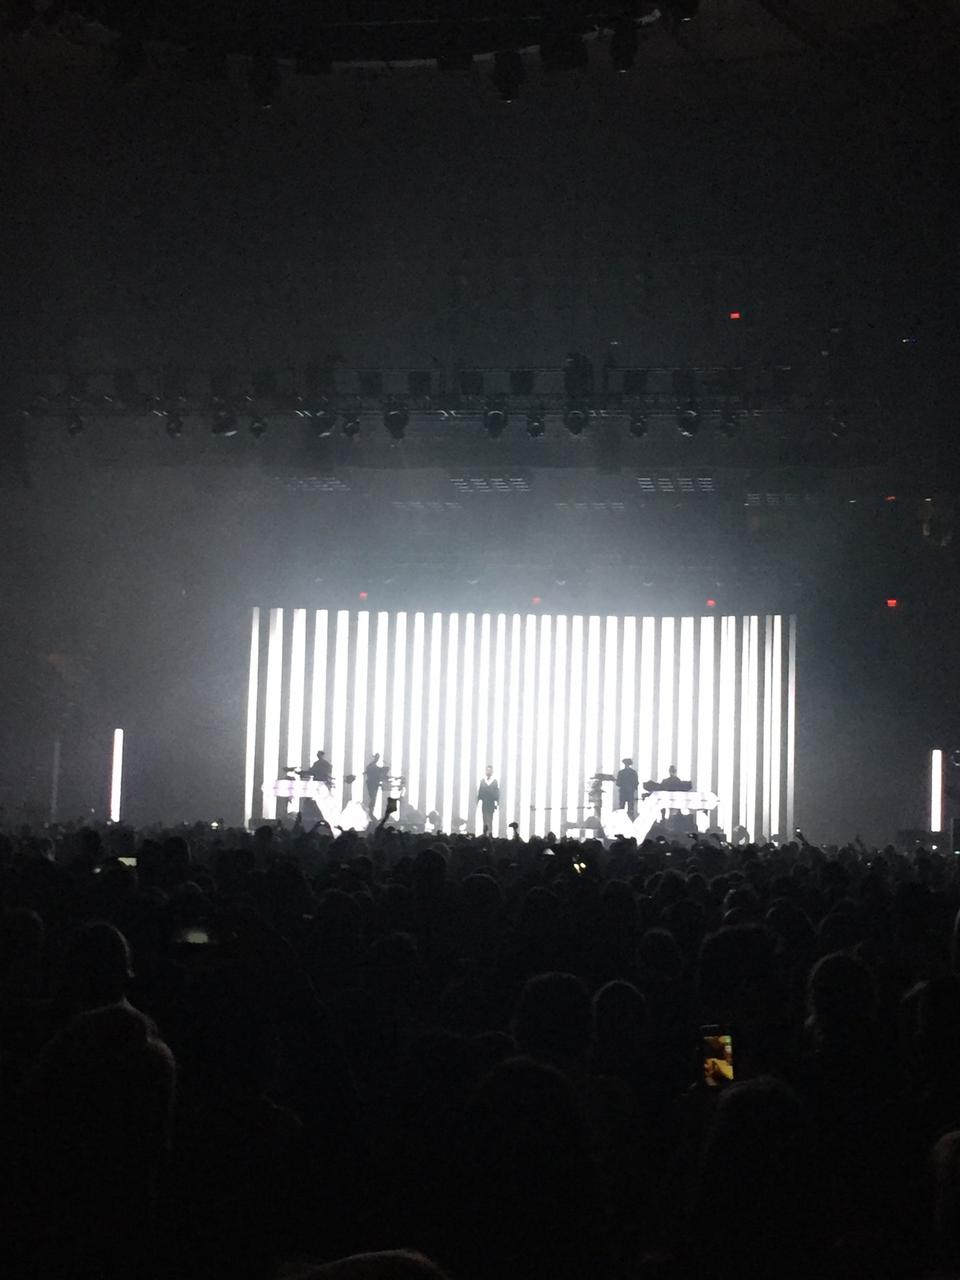 Madison Square Garden: Madison Square Garden General Admission Floor Concert